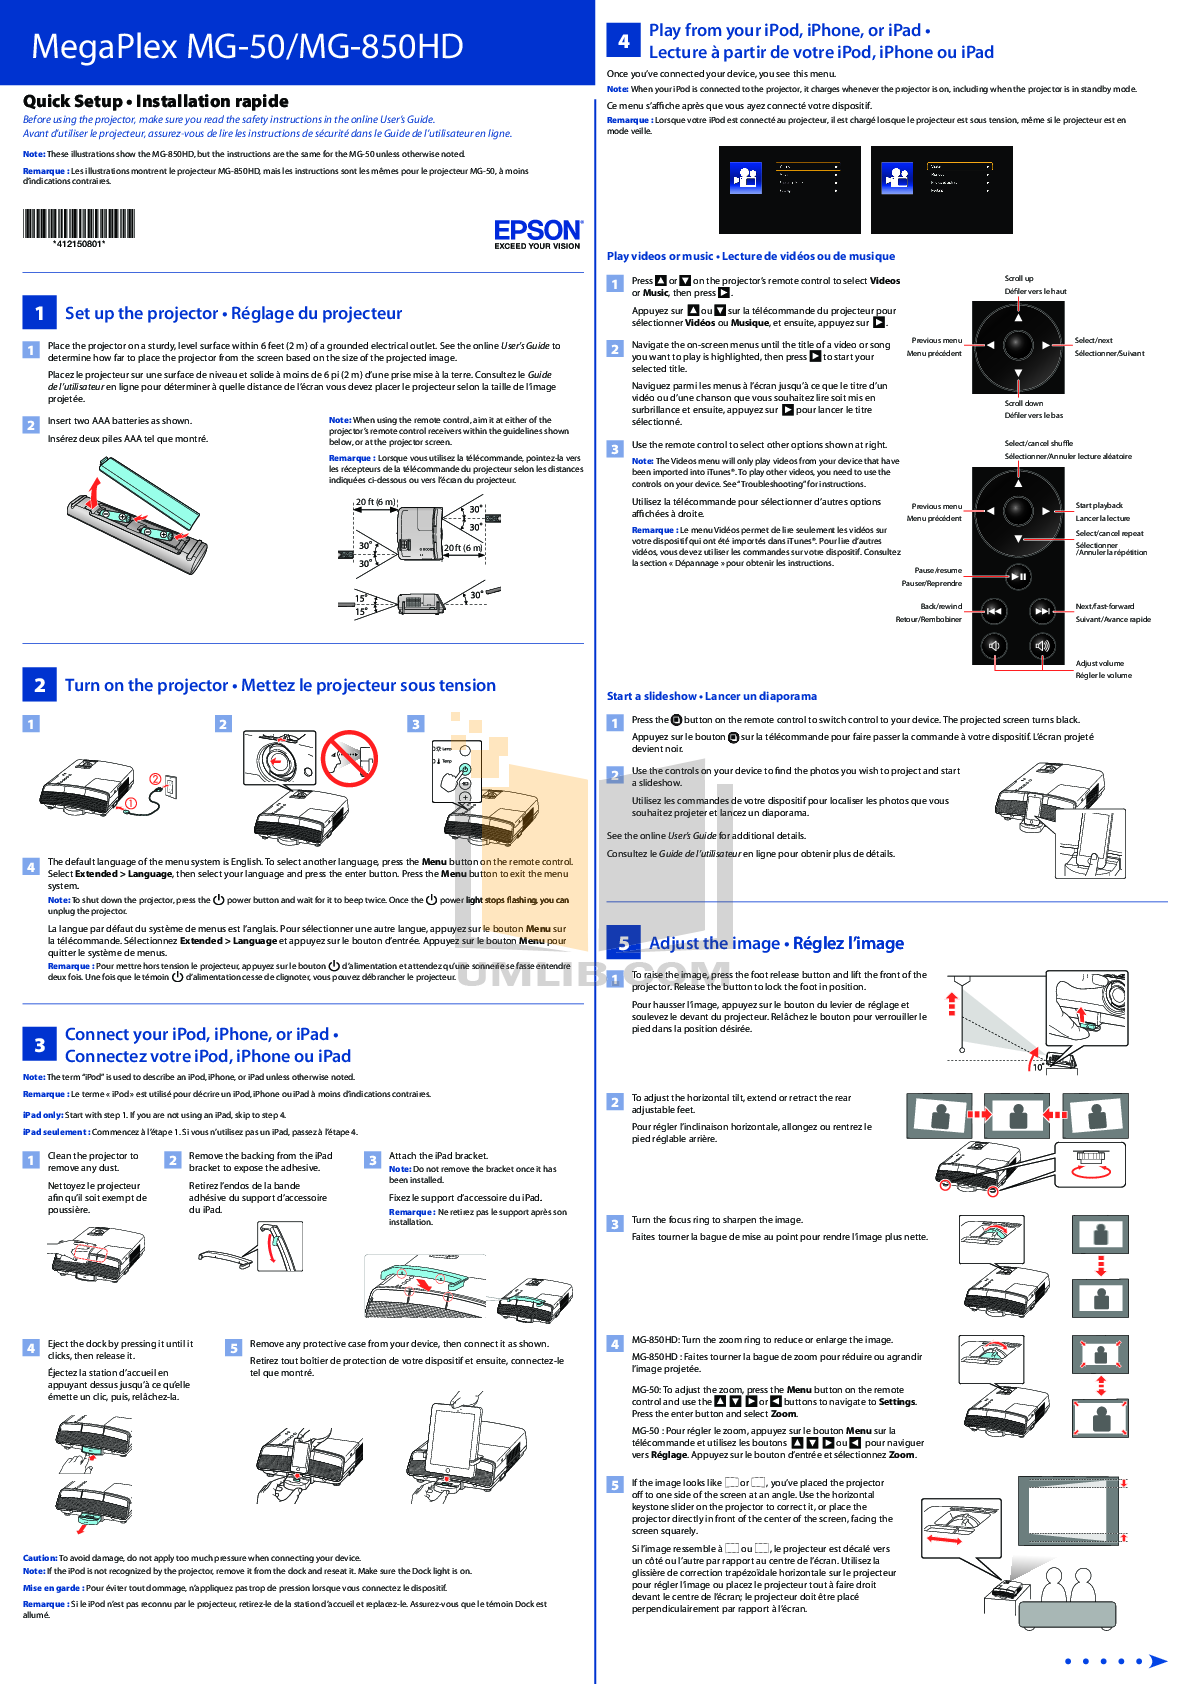 pdf for Epson Projector Megaplex MG-850HD manual